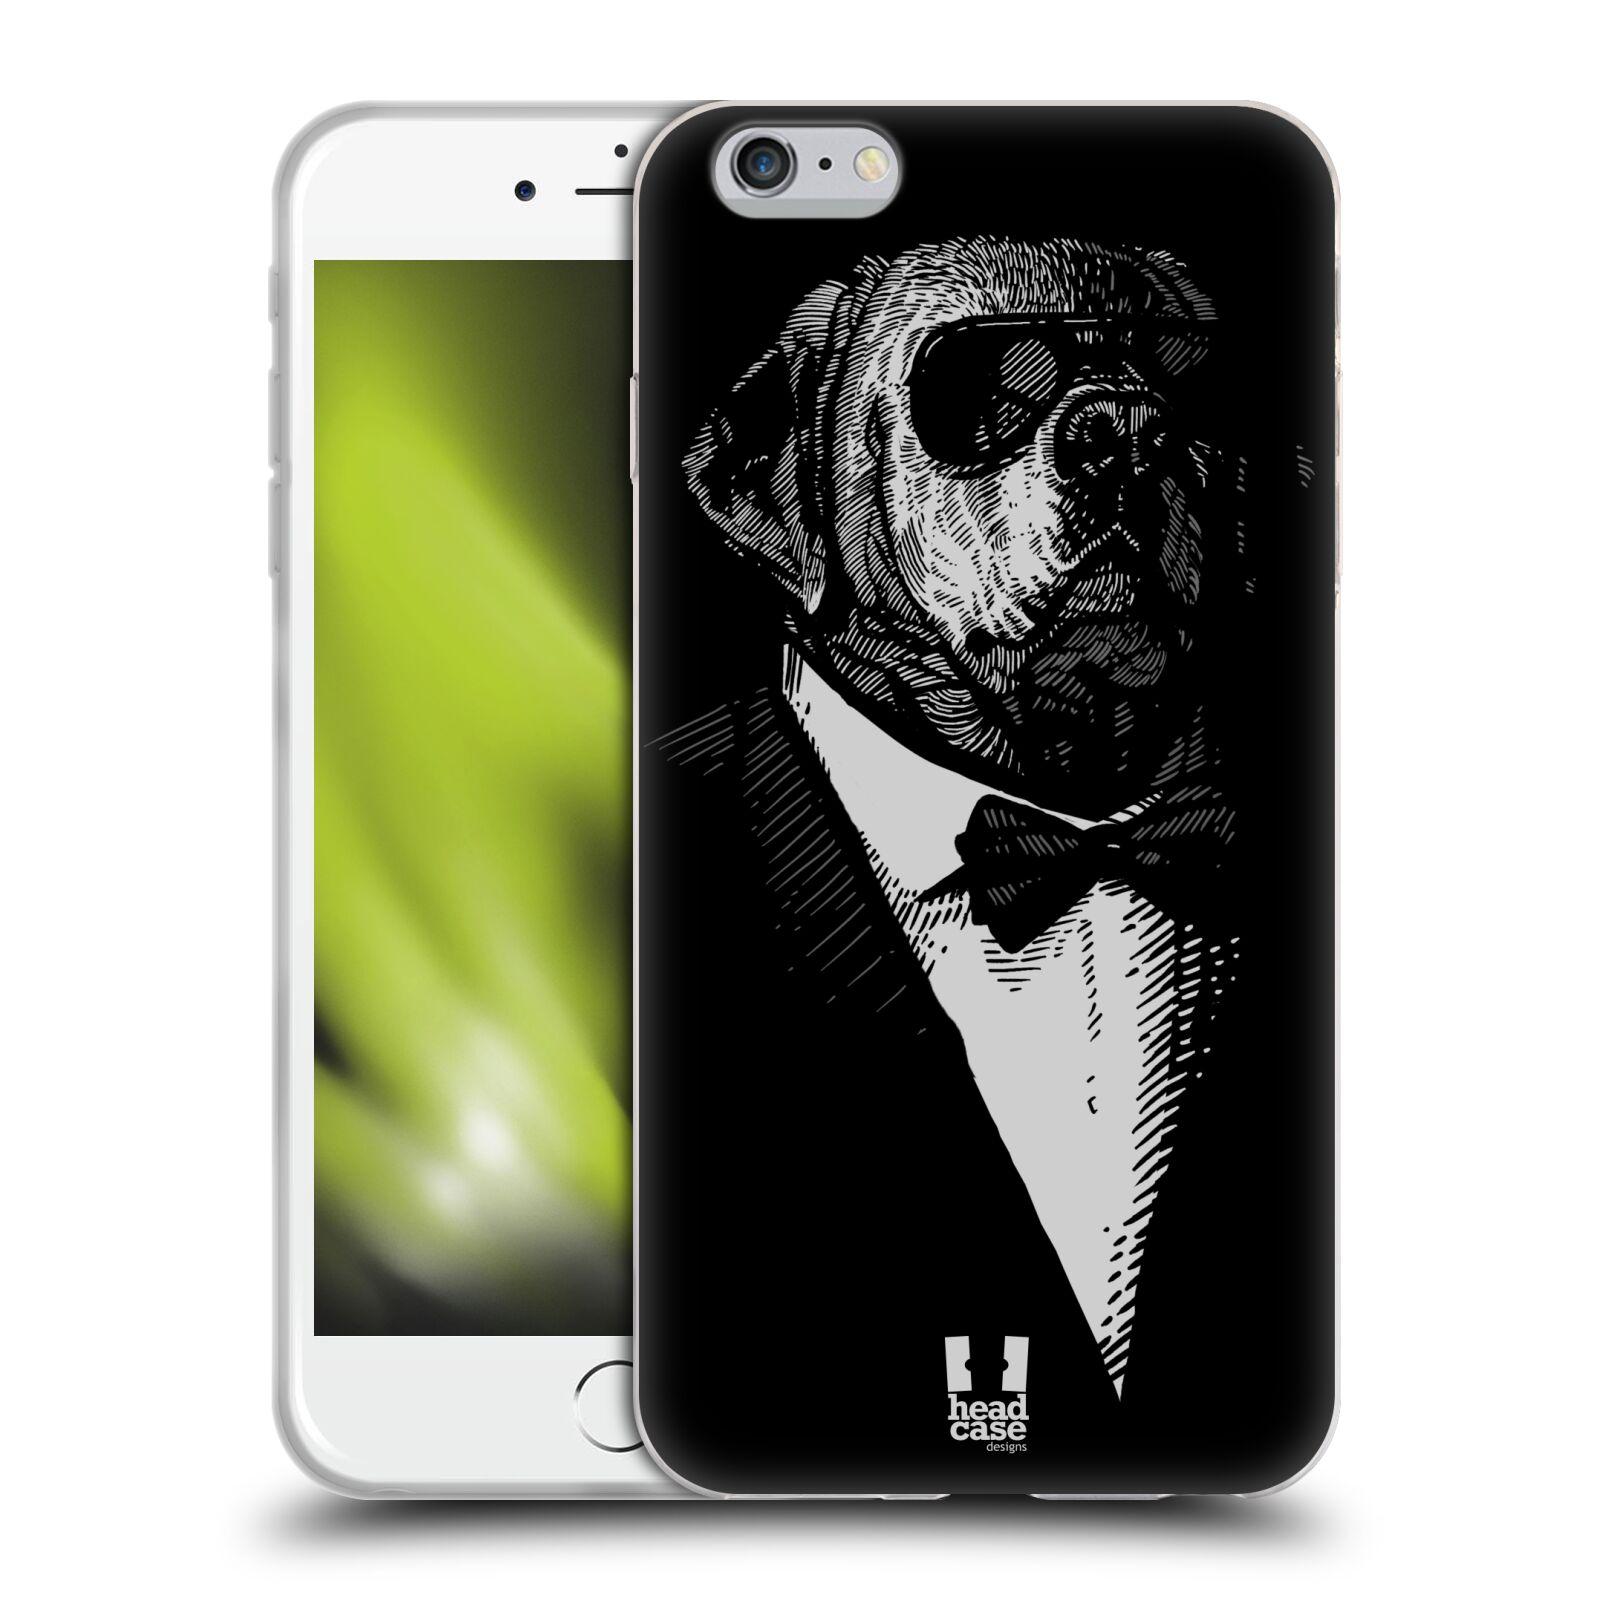 HEAD CASE silikonový obal na mobil Apple Iphone 6 PLUS/ 6S PLUS vzor Zvíře v obleku pes